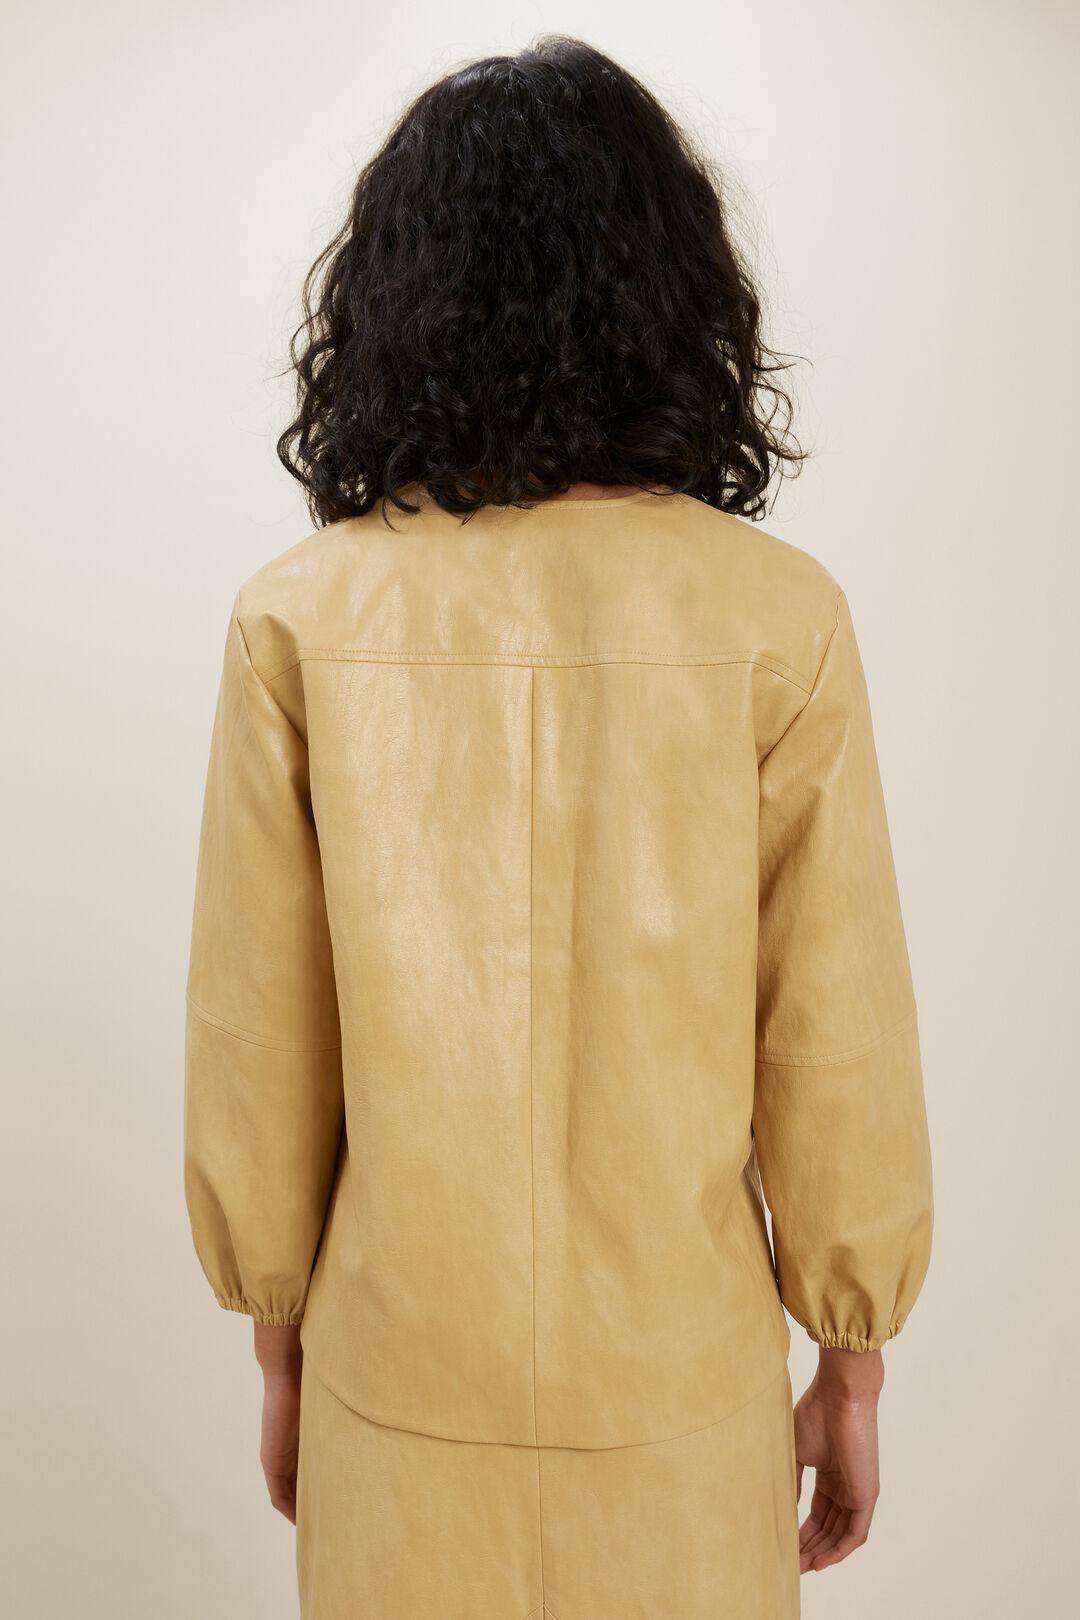 Vegan Leather V Neck Blouse  FAWN  hi-res